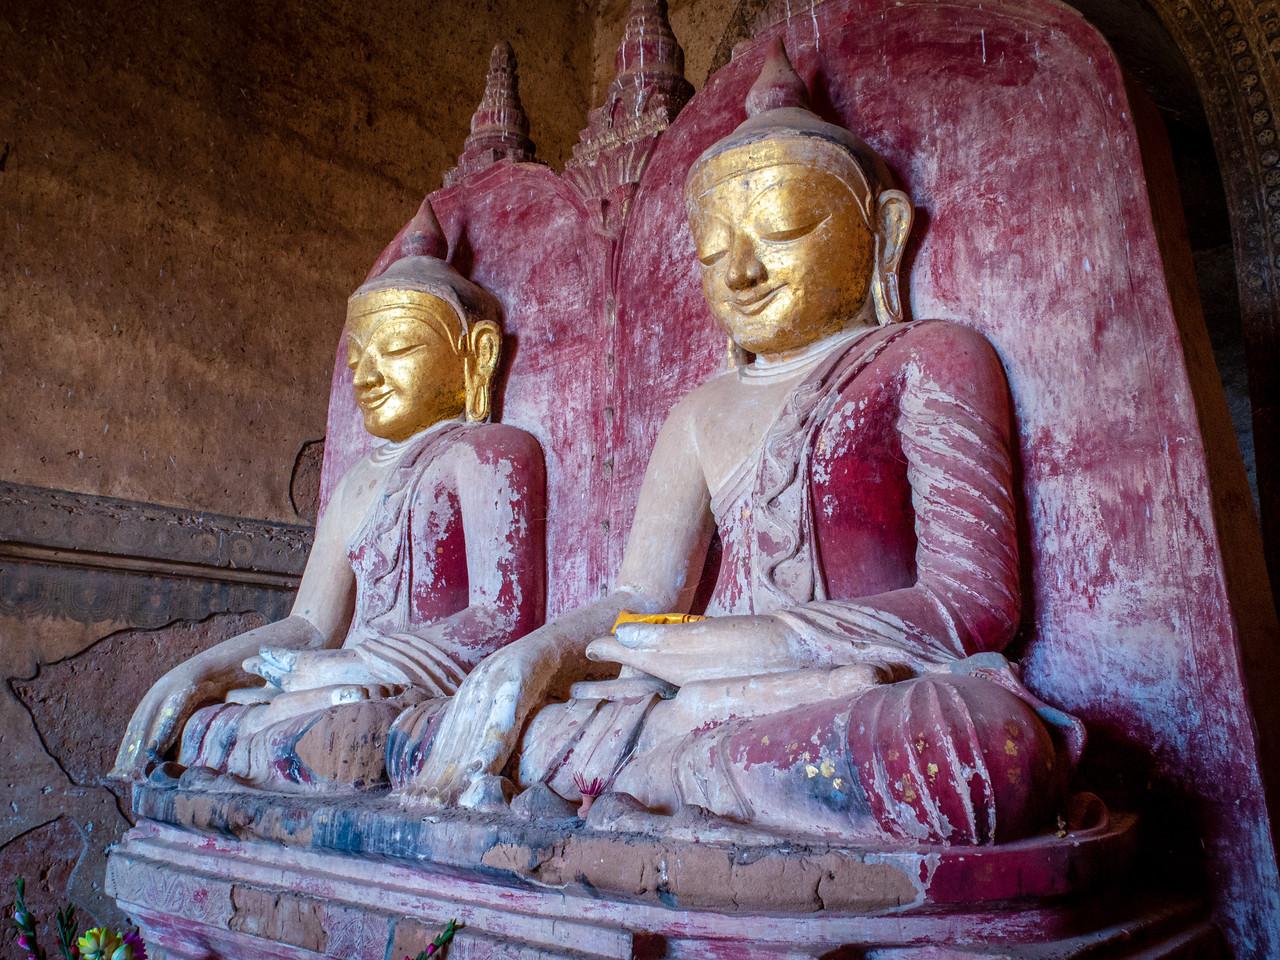 Peaceful Buddhas in a Burmese Temple in Bagan